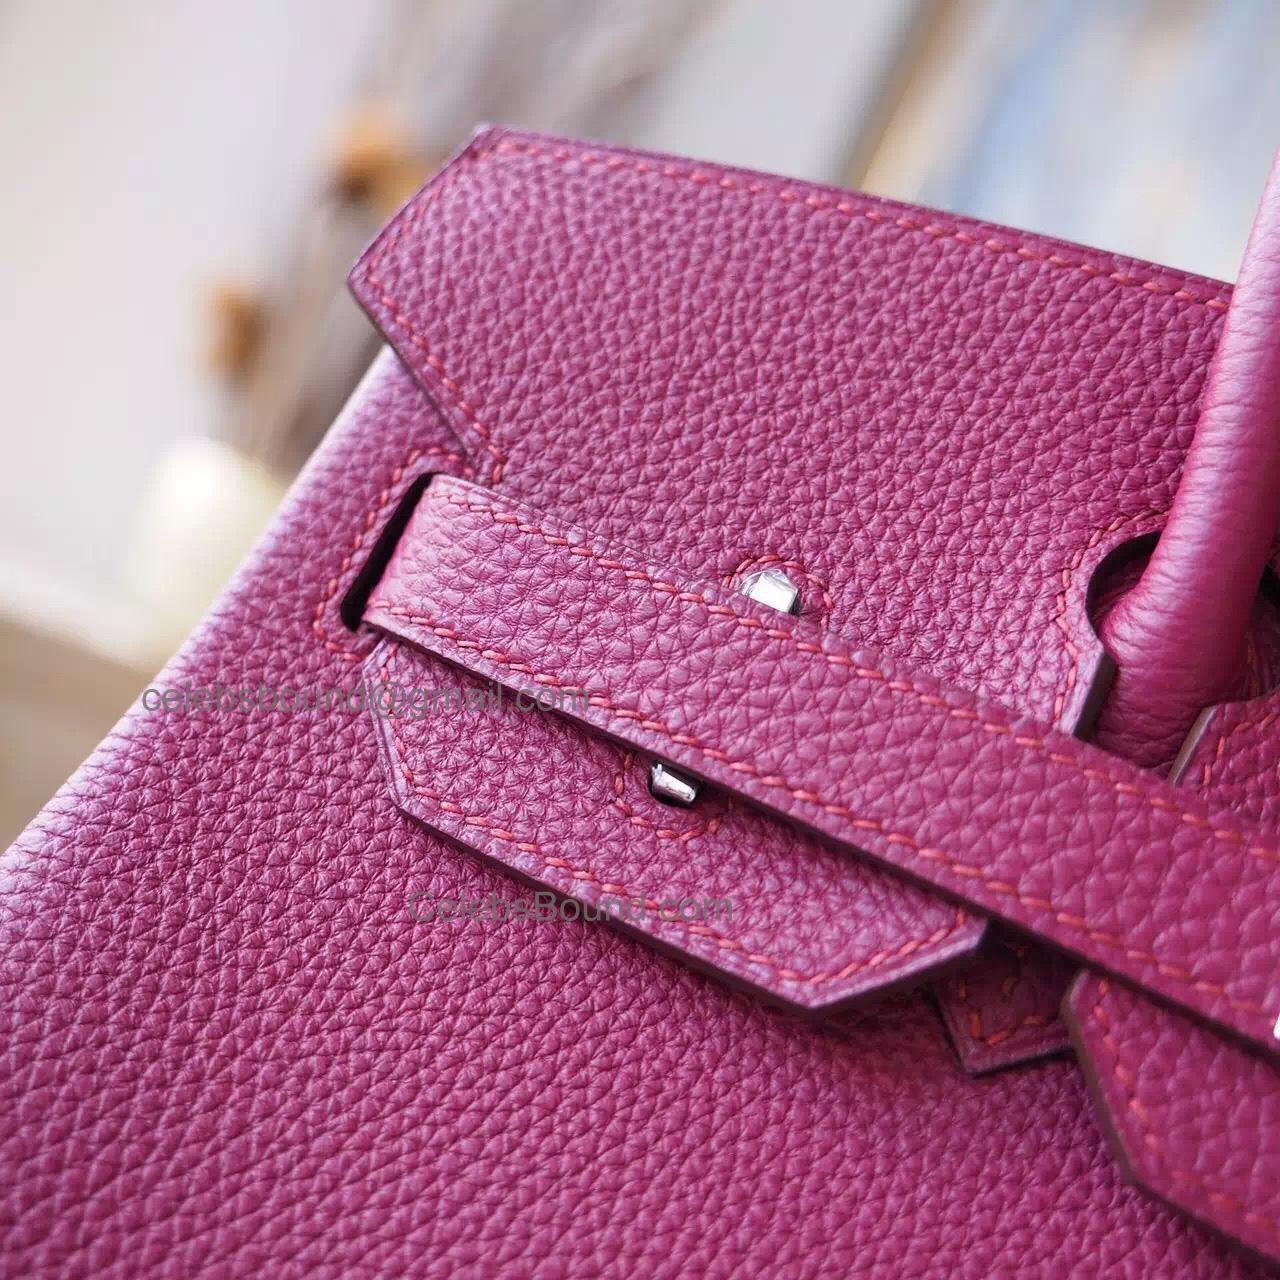 c8e256b5b443 Hand Stitched Hermes Birkin 30 Bag in k5 Tosca Togo Calfskin SHW -